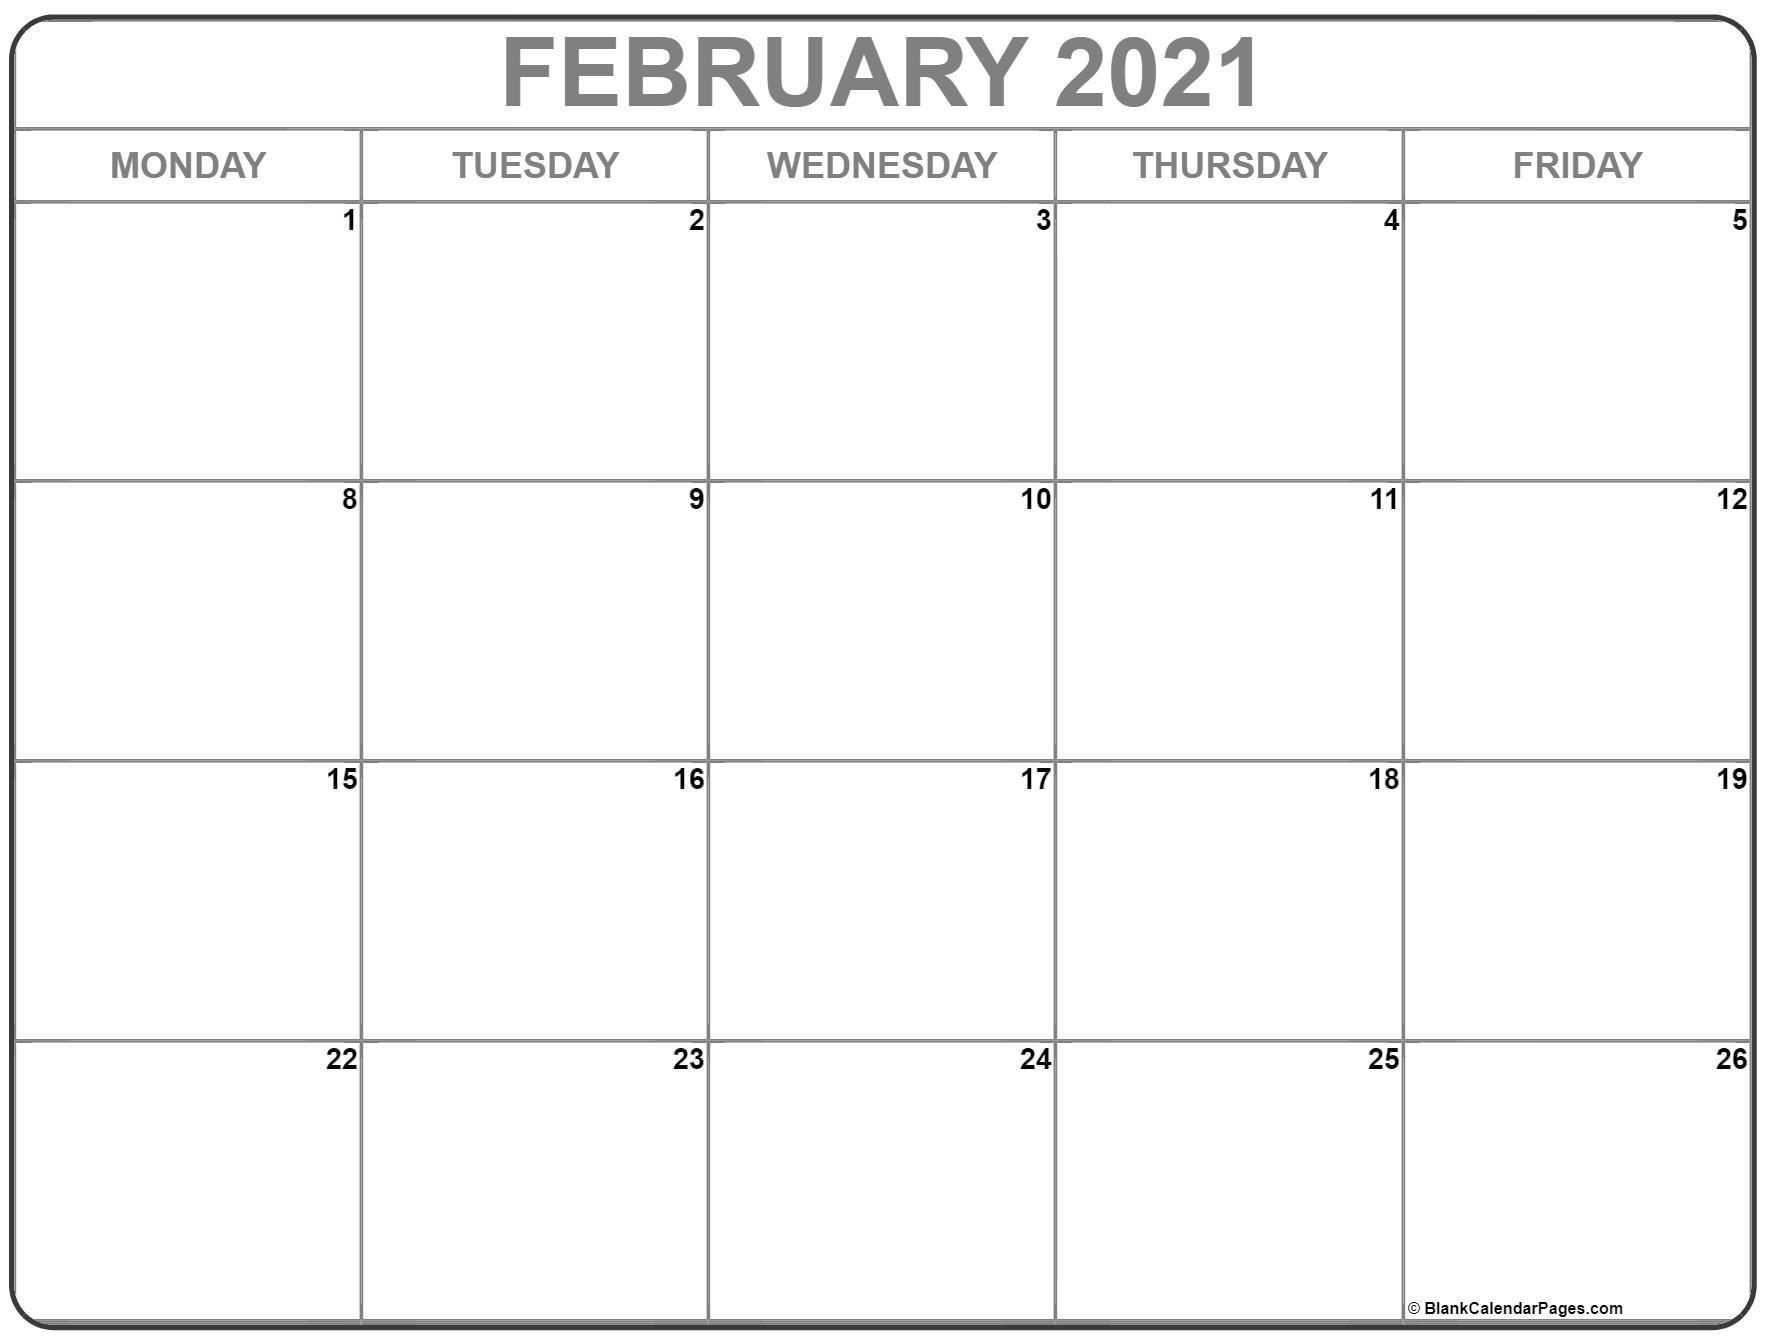 February 2021 Monday Calendar | Monday To Sunday-Printable Monday - Friday July 2021